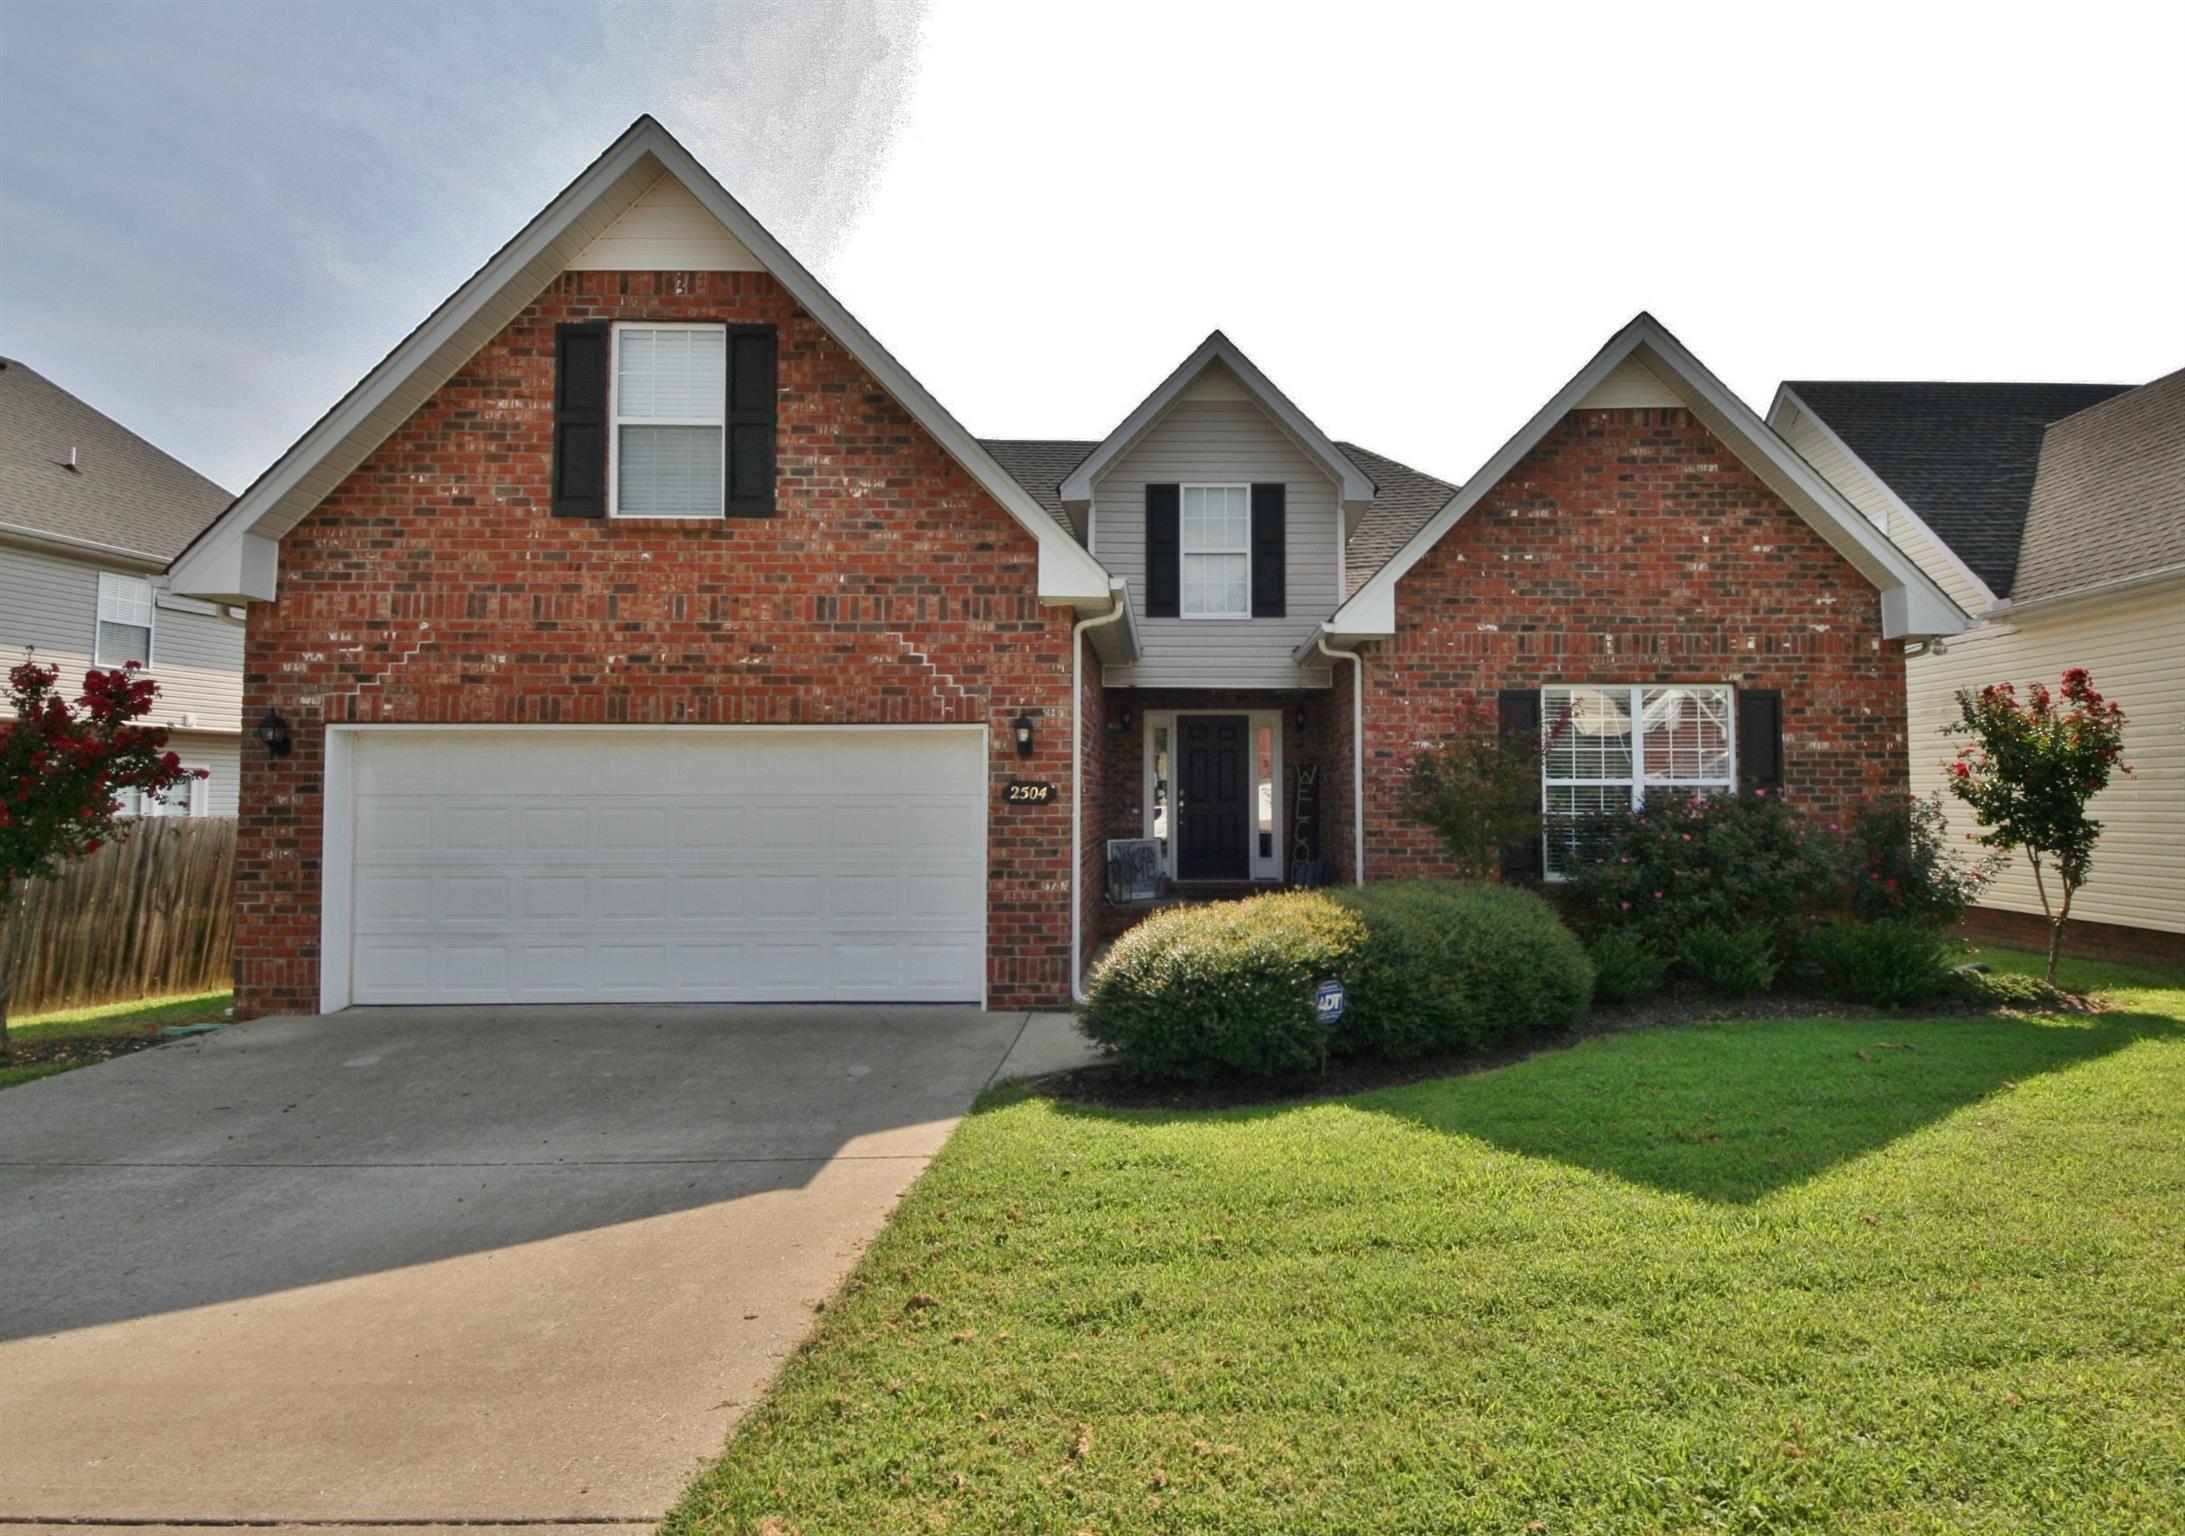 Photo of 2504 Oak Hill Dr  Murfreesboro  TN